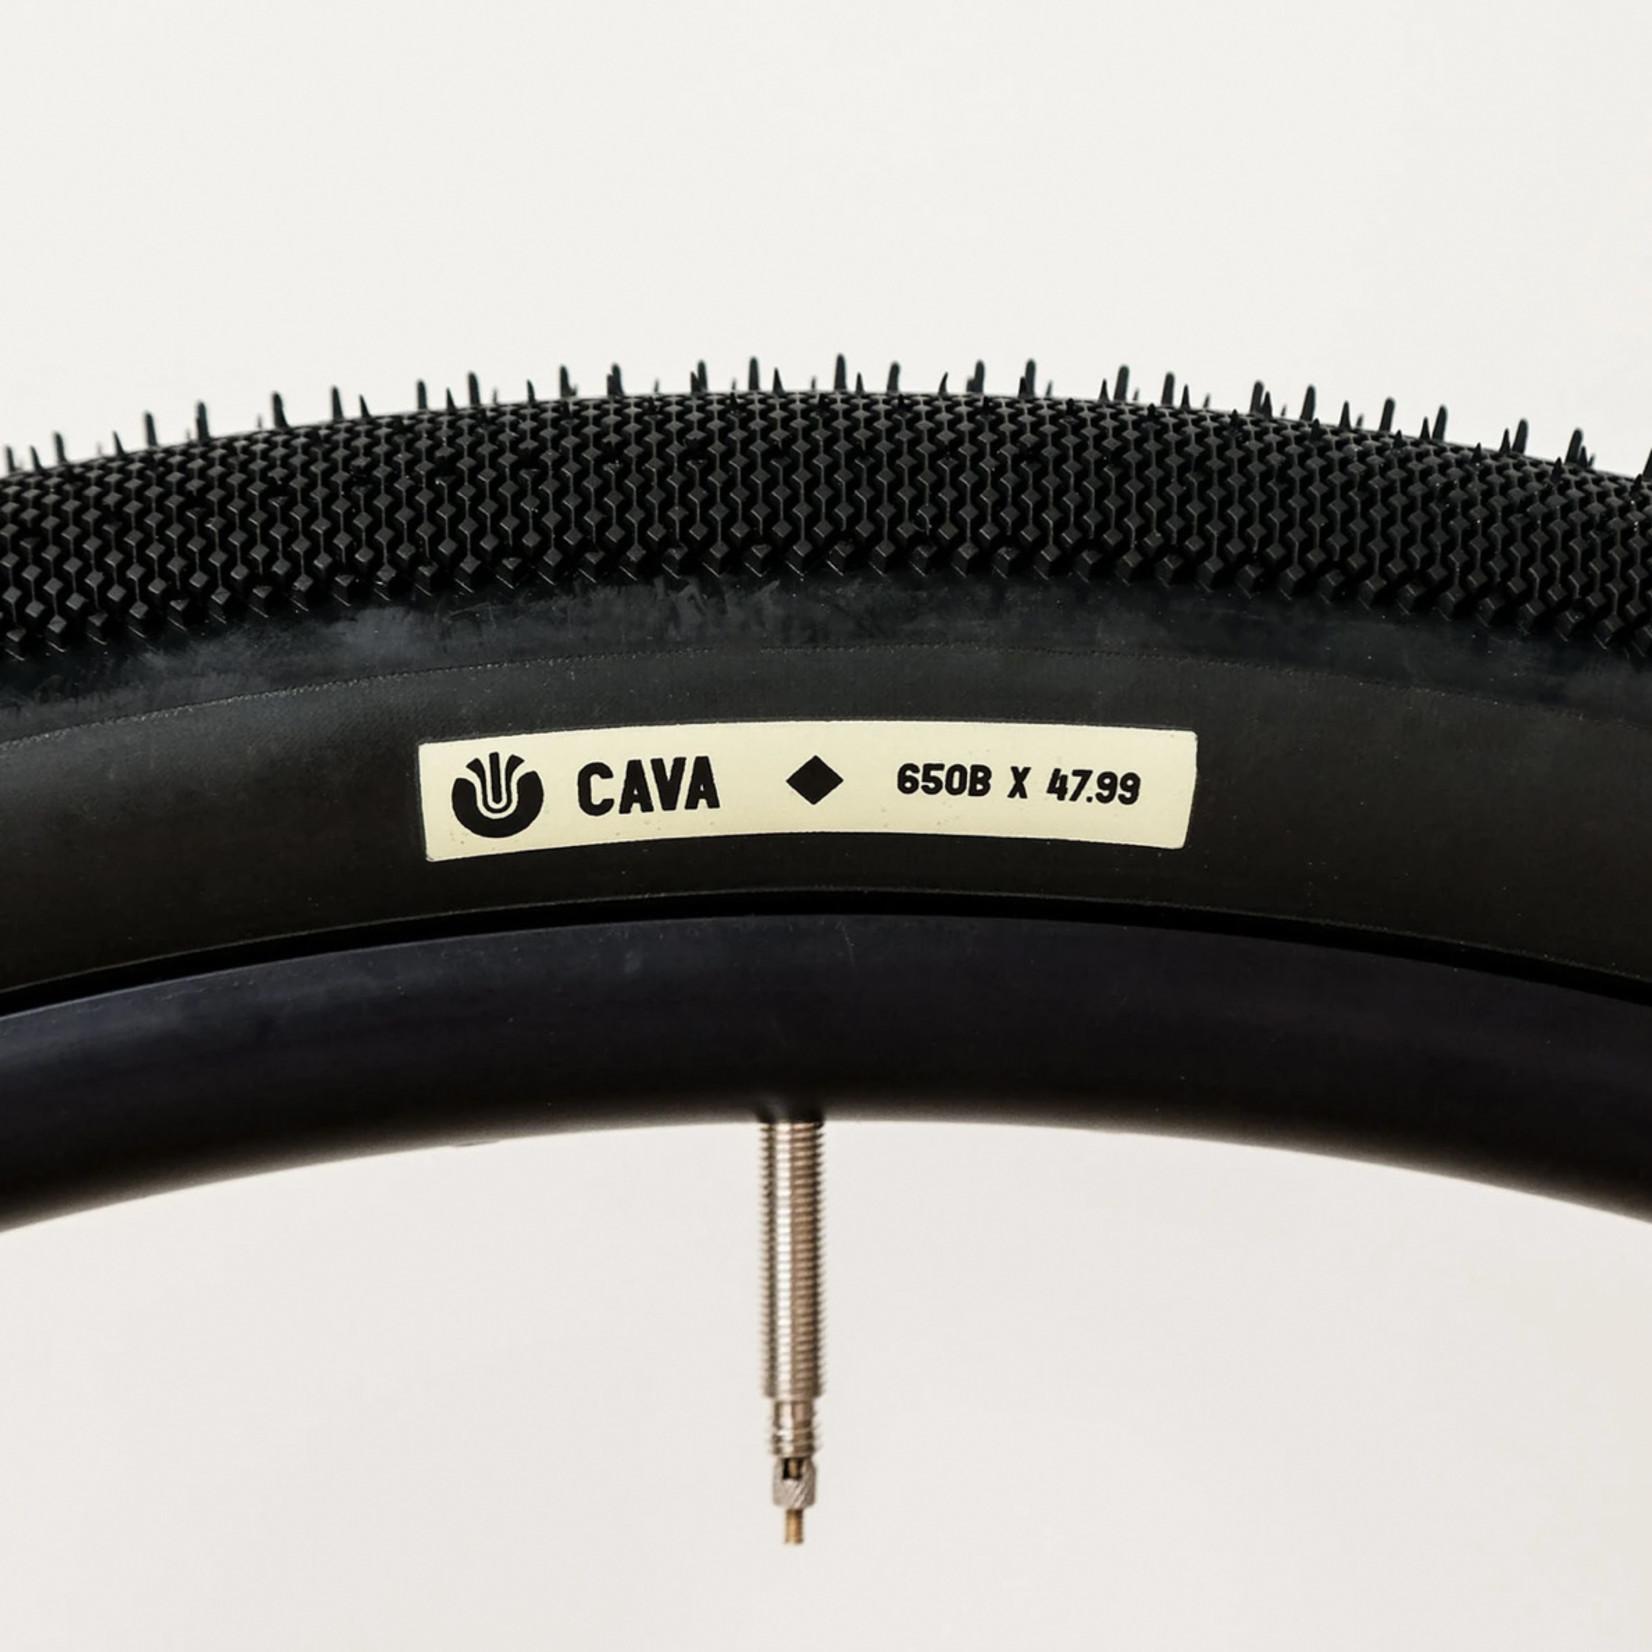 Ultradynamico Tires - Cava Robusto - 650b x 48